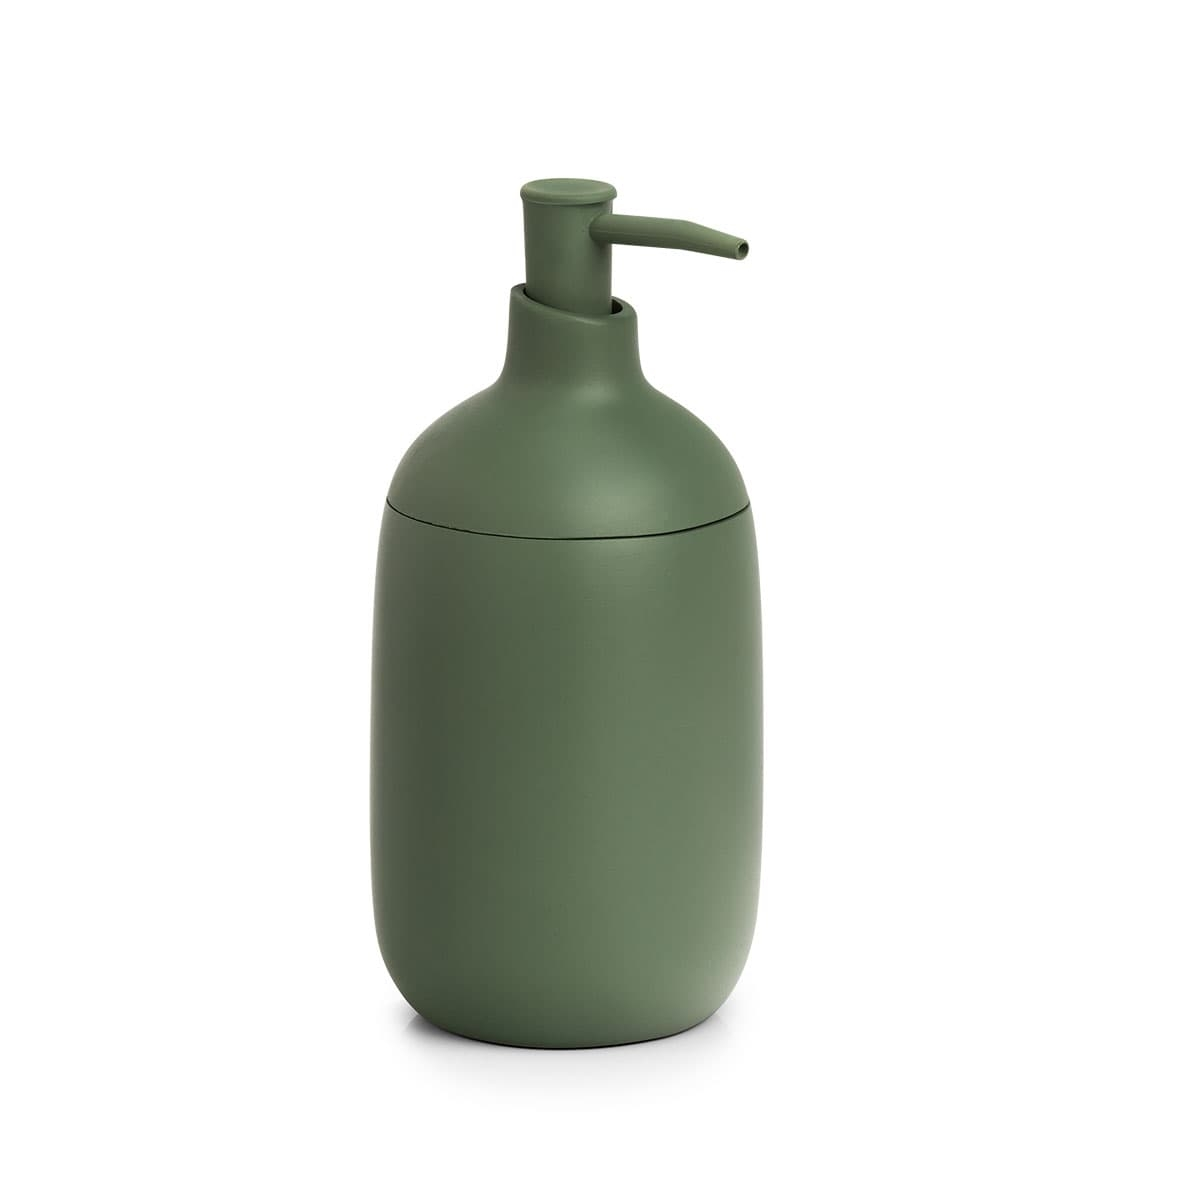 Dozator pentru sapun din polirasina, Sage Verde Inchis, Ø7,2xH16 cm somproduct.ro